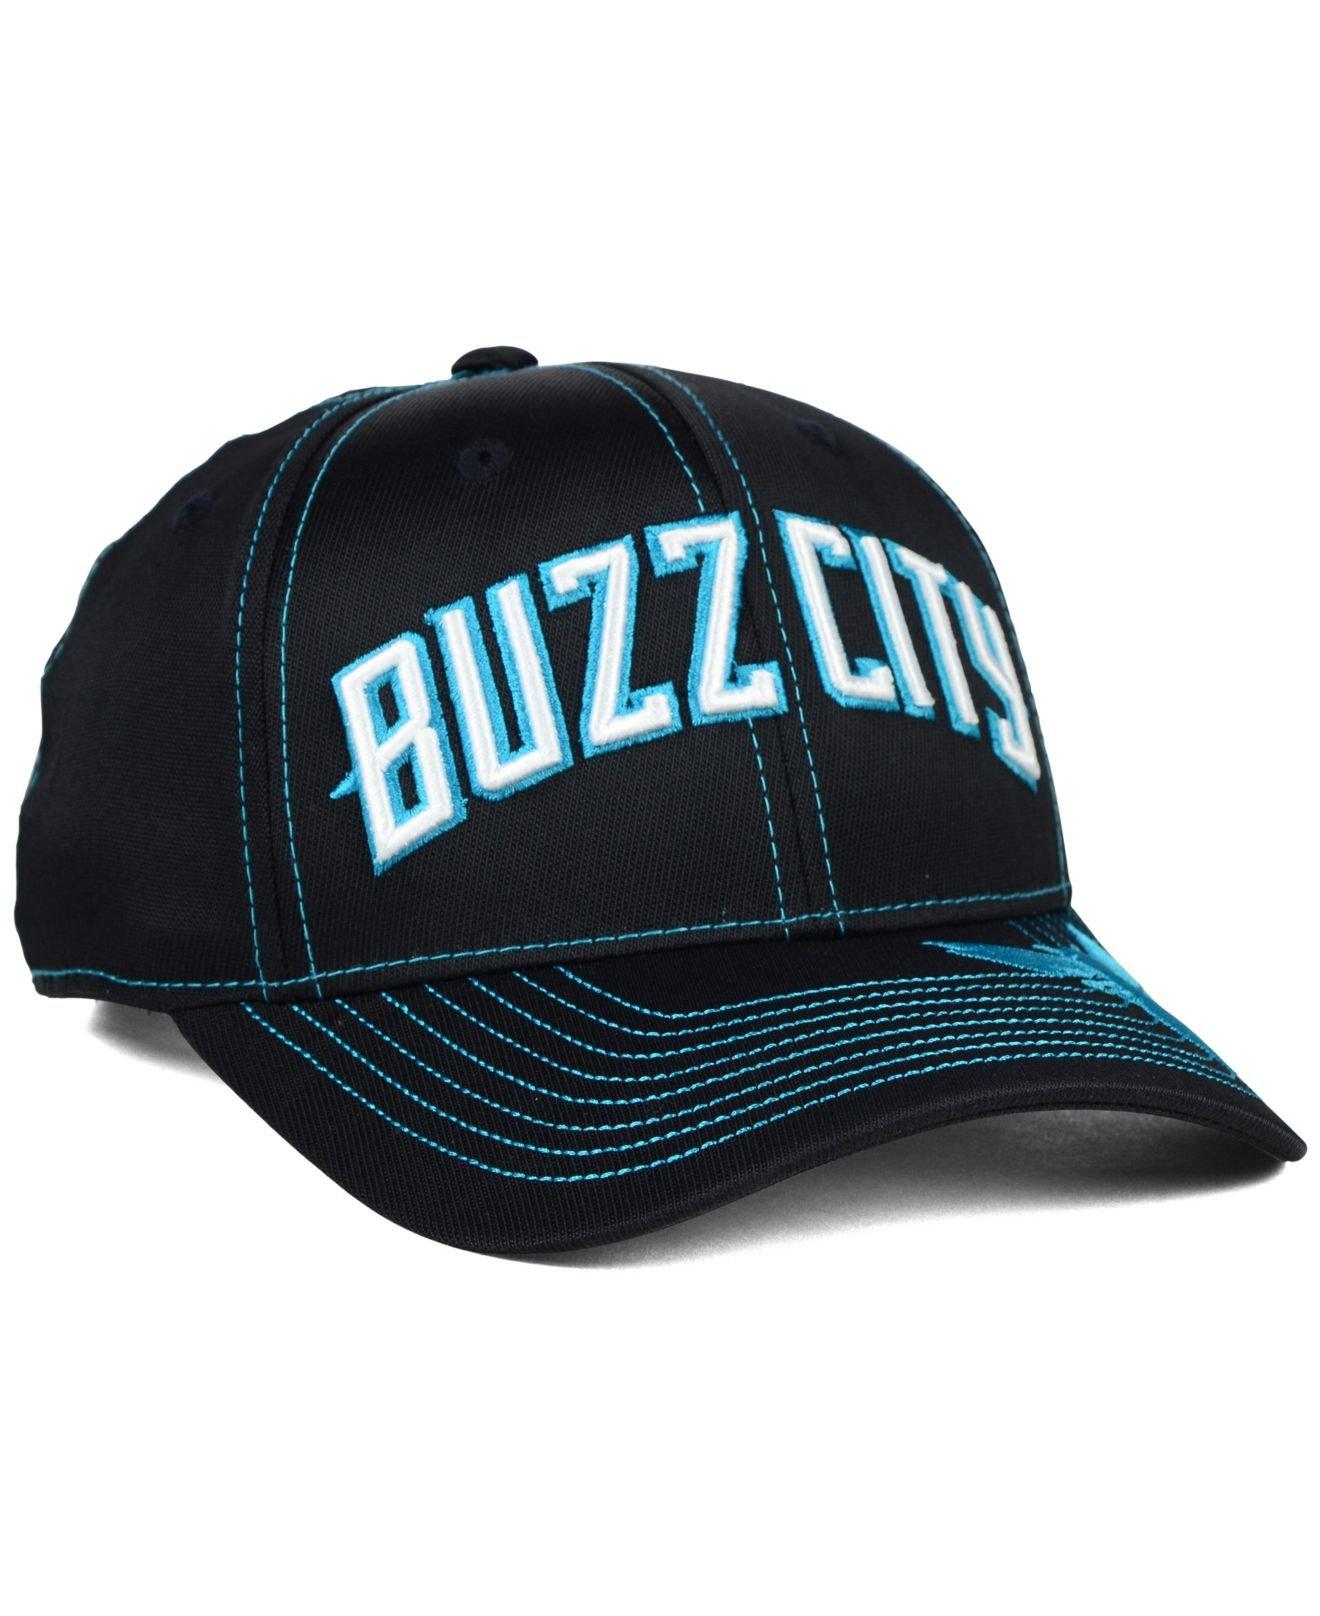 info for dd226 581c9 ... ireland lyst adidas charlotte hornets pride jersey hook adjustable cap  in 31ffc 6288c